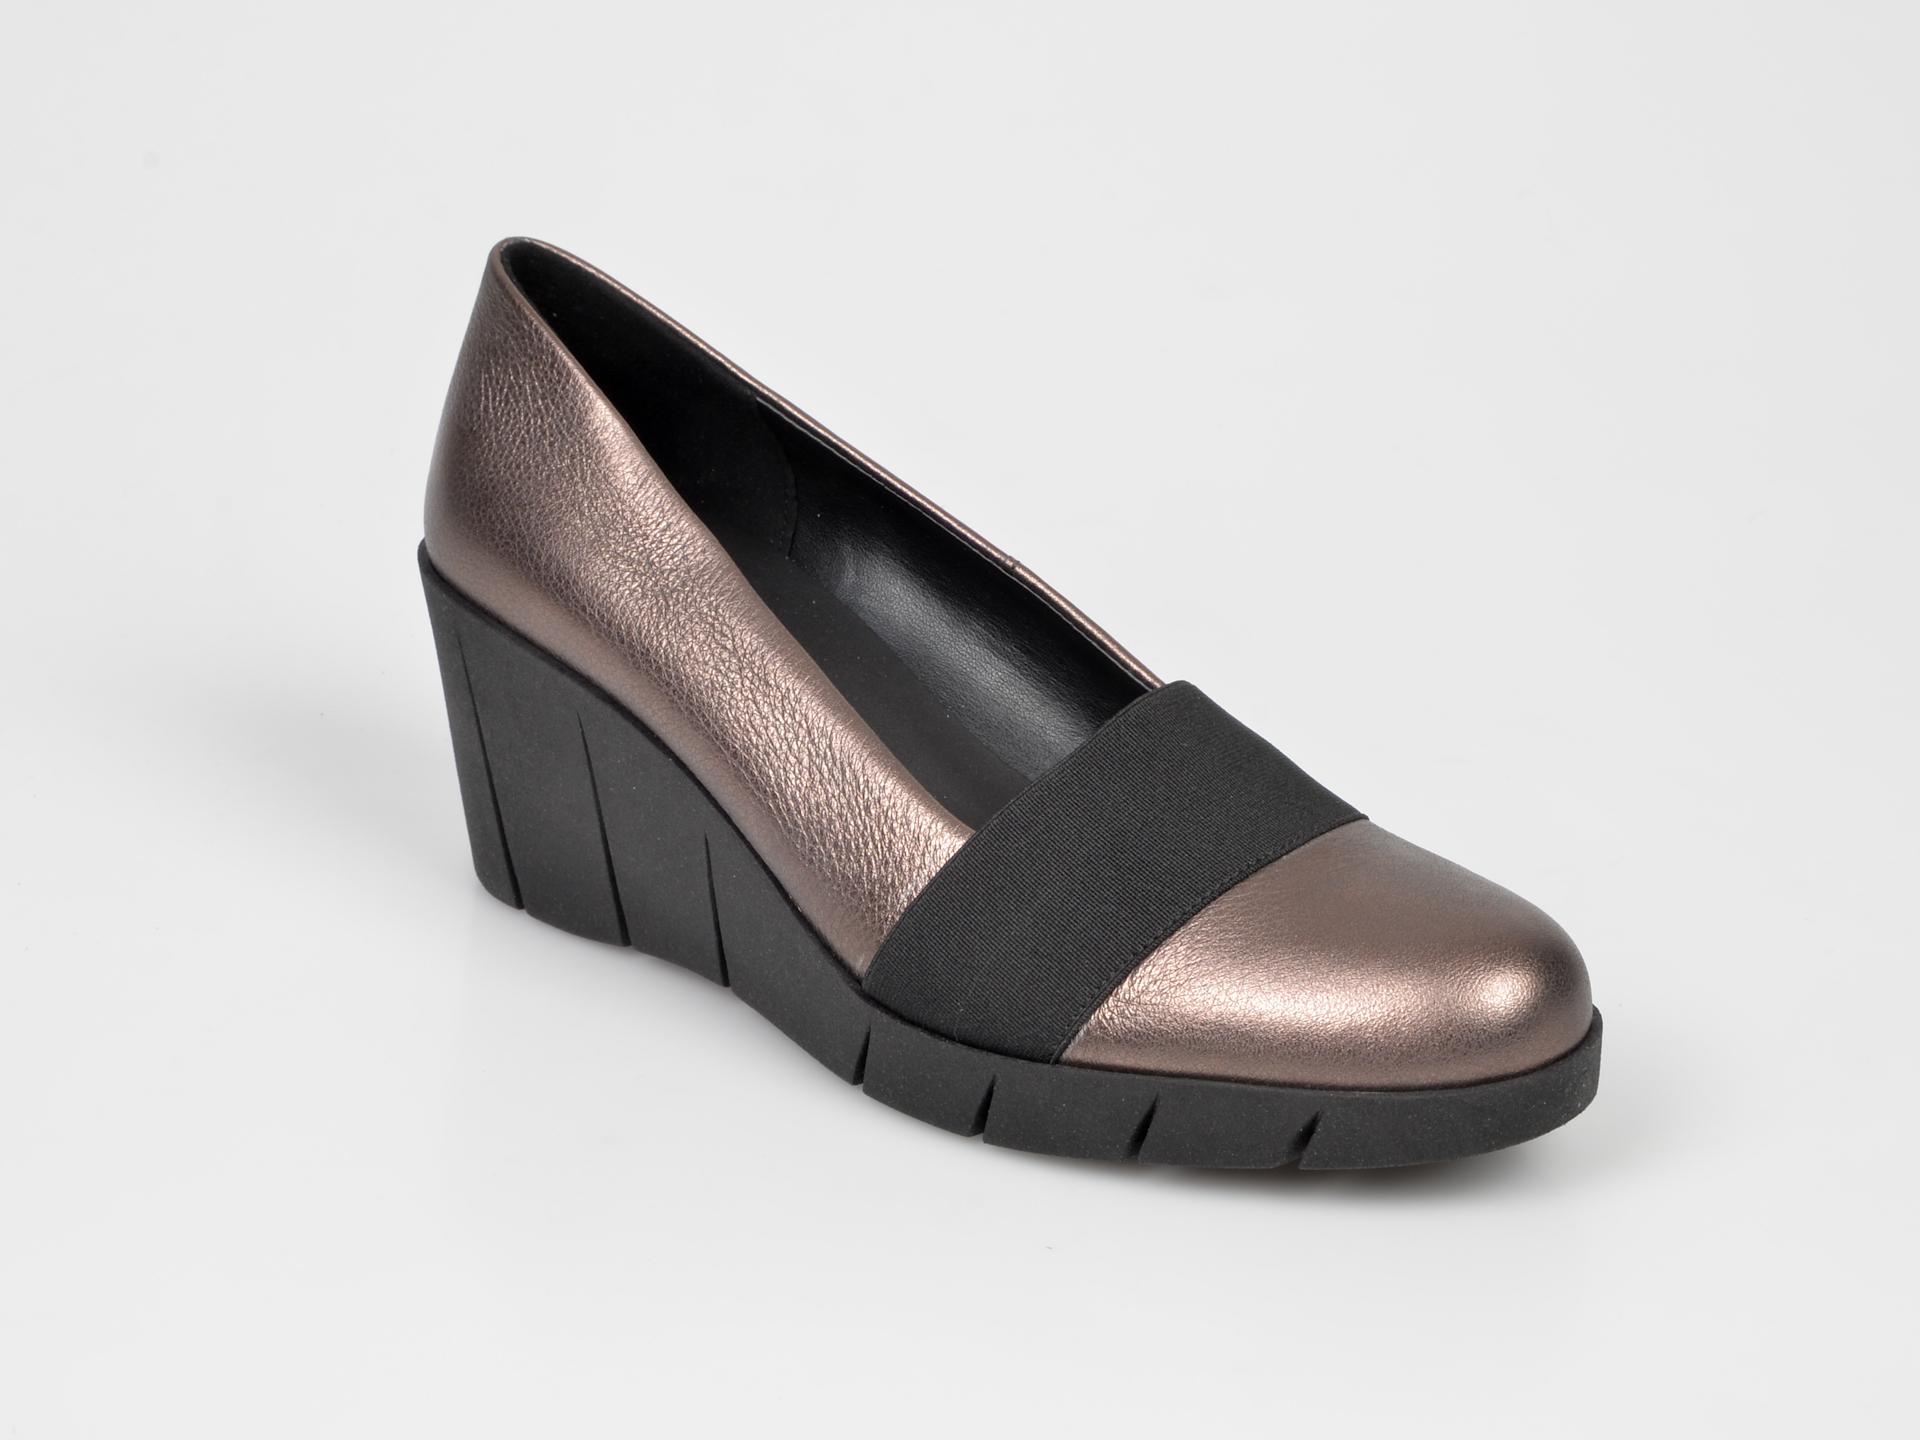 Pantofi The FLEXX aurii, Pumpspa, din piele naturala